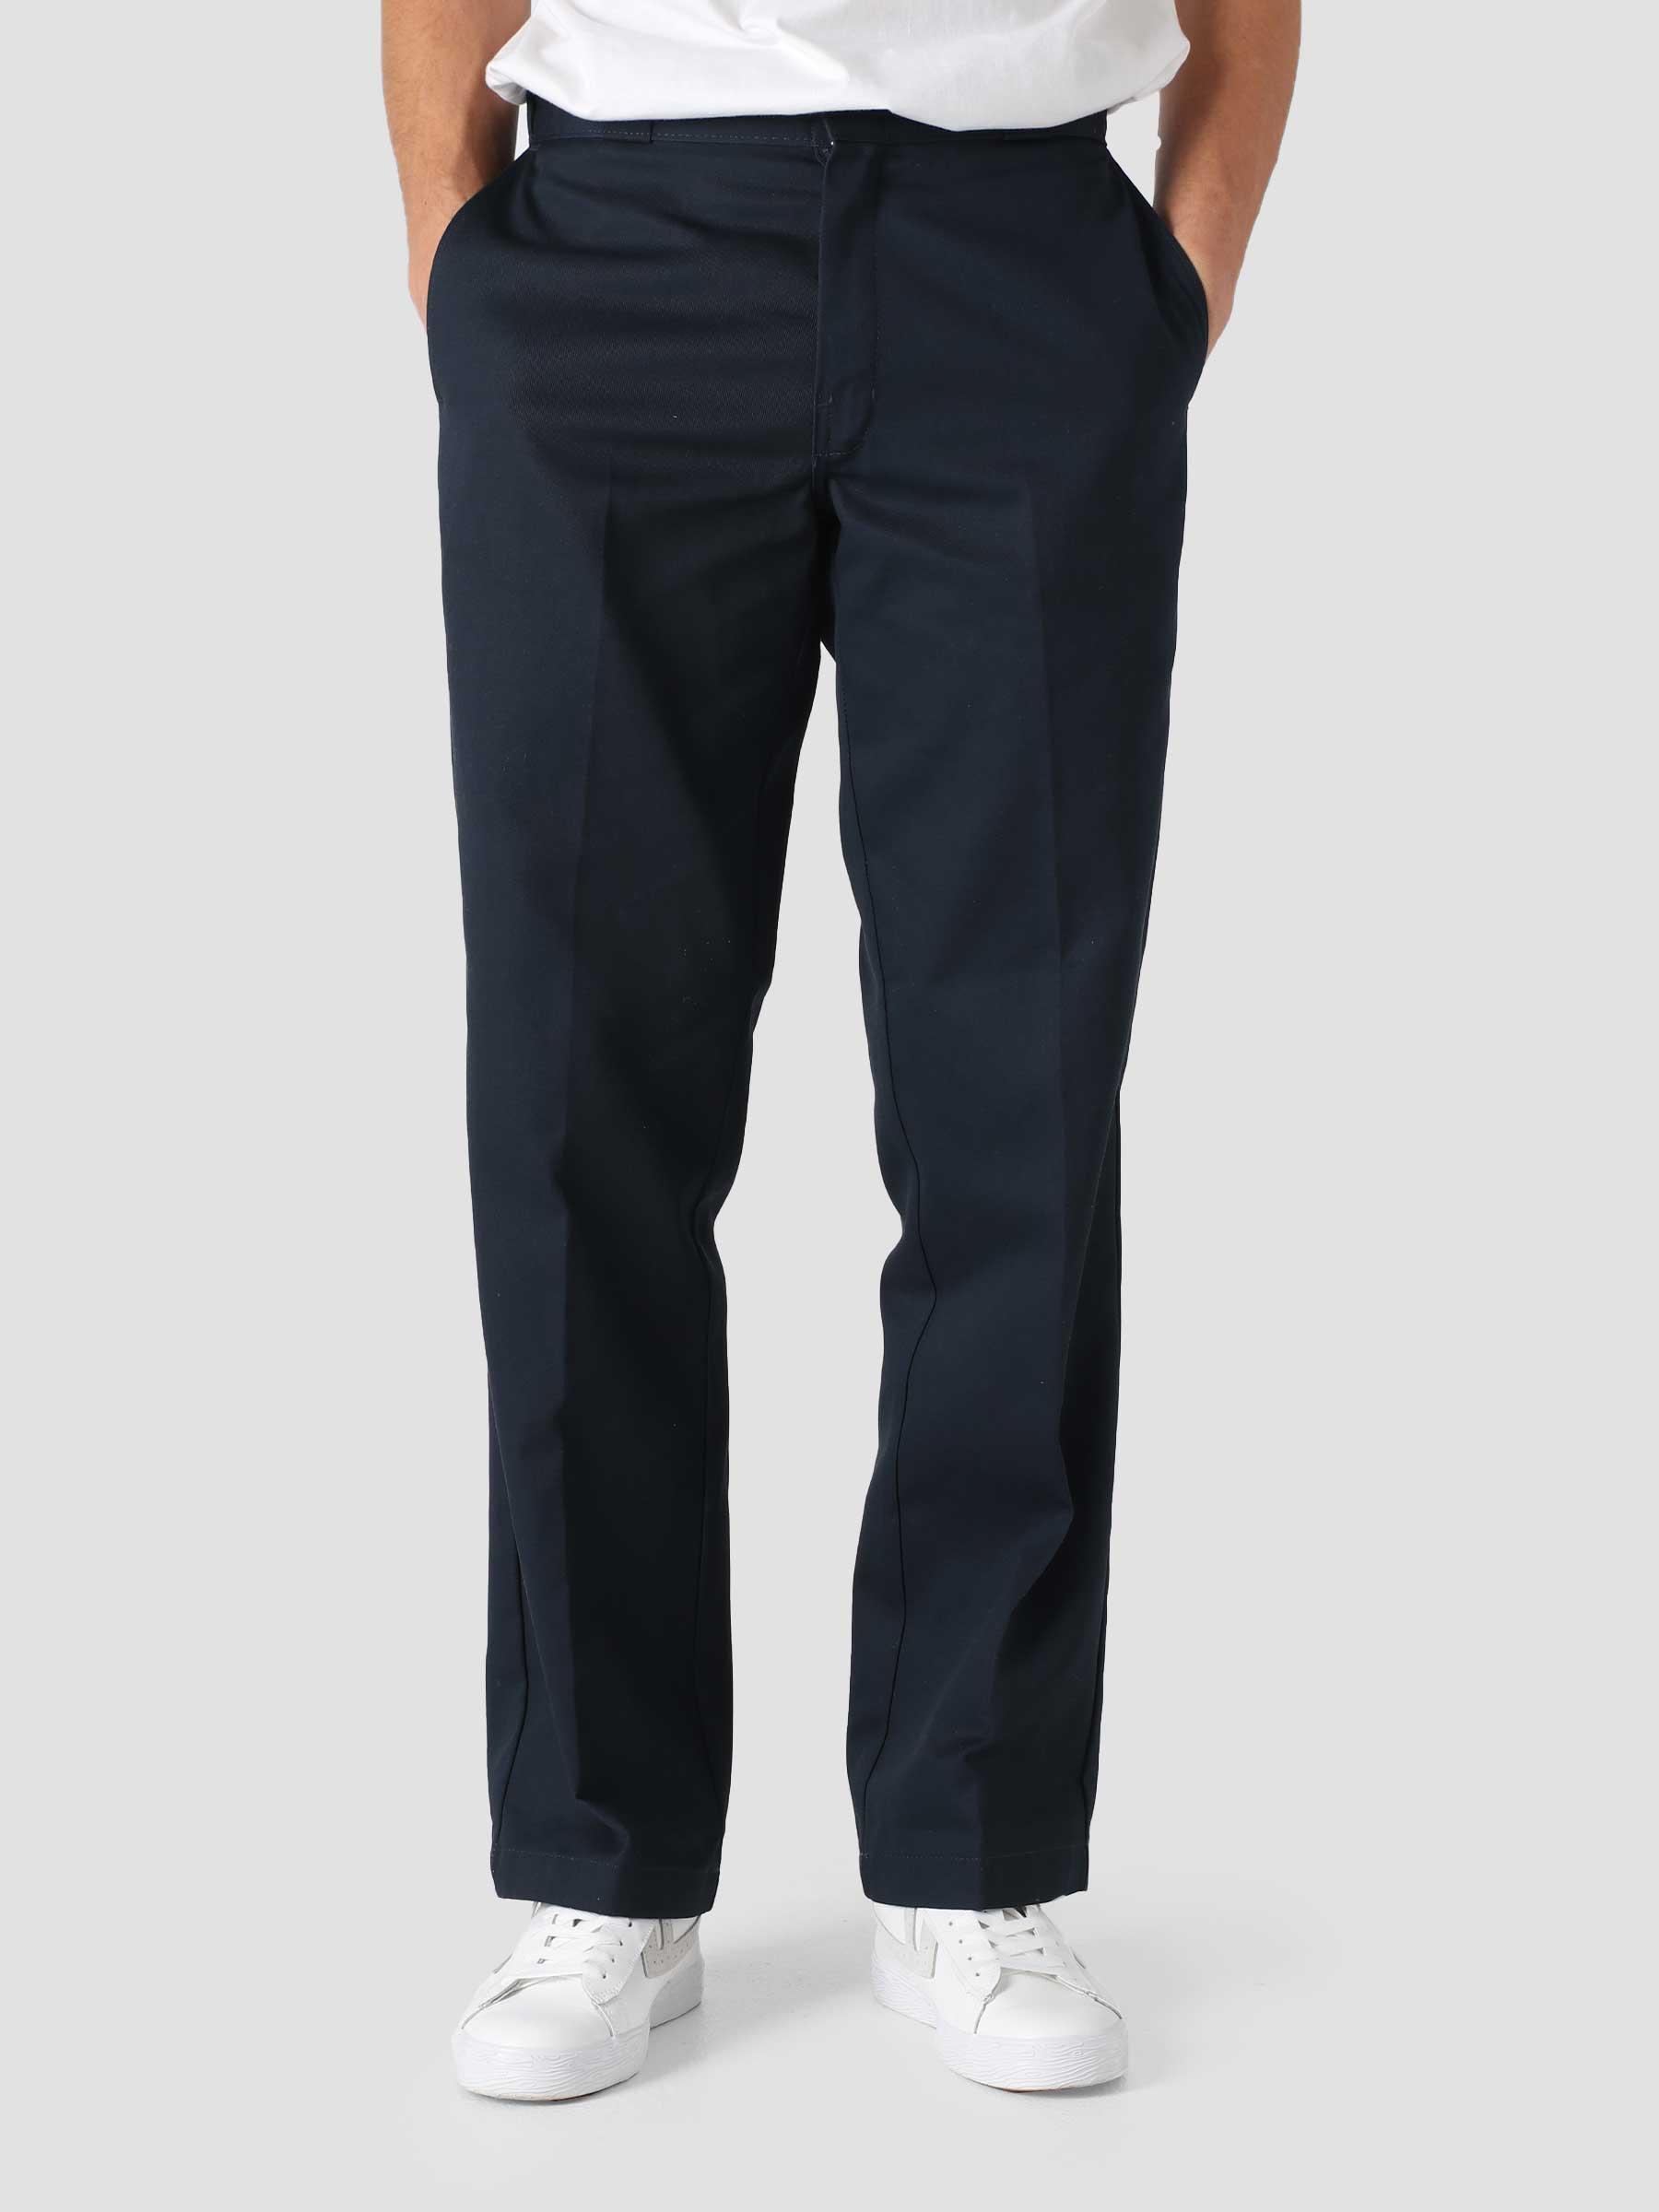 Original Fit Straight Leg Work Pant Dark Navy DK000874DNX